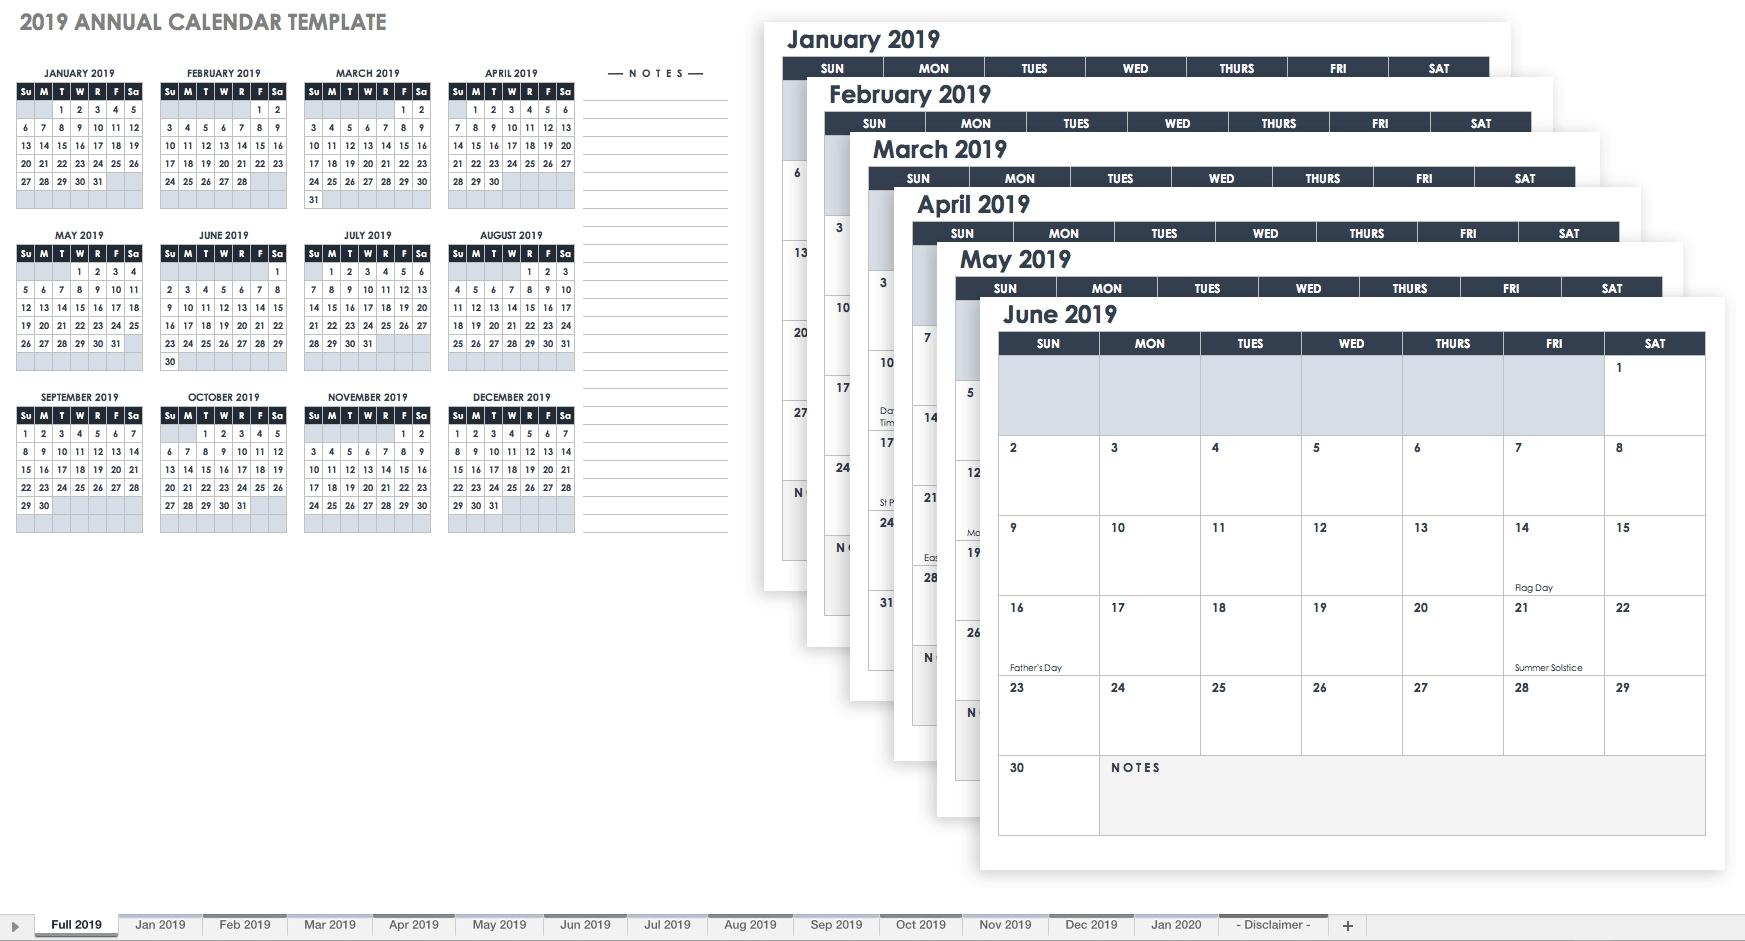 15 Free Monthly Calendar Templates | Smartsheet Calendar 2019 For Excel